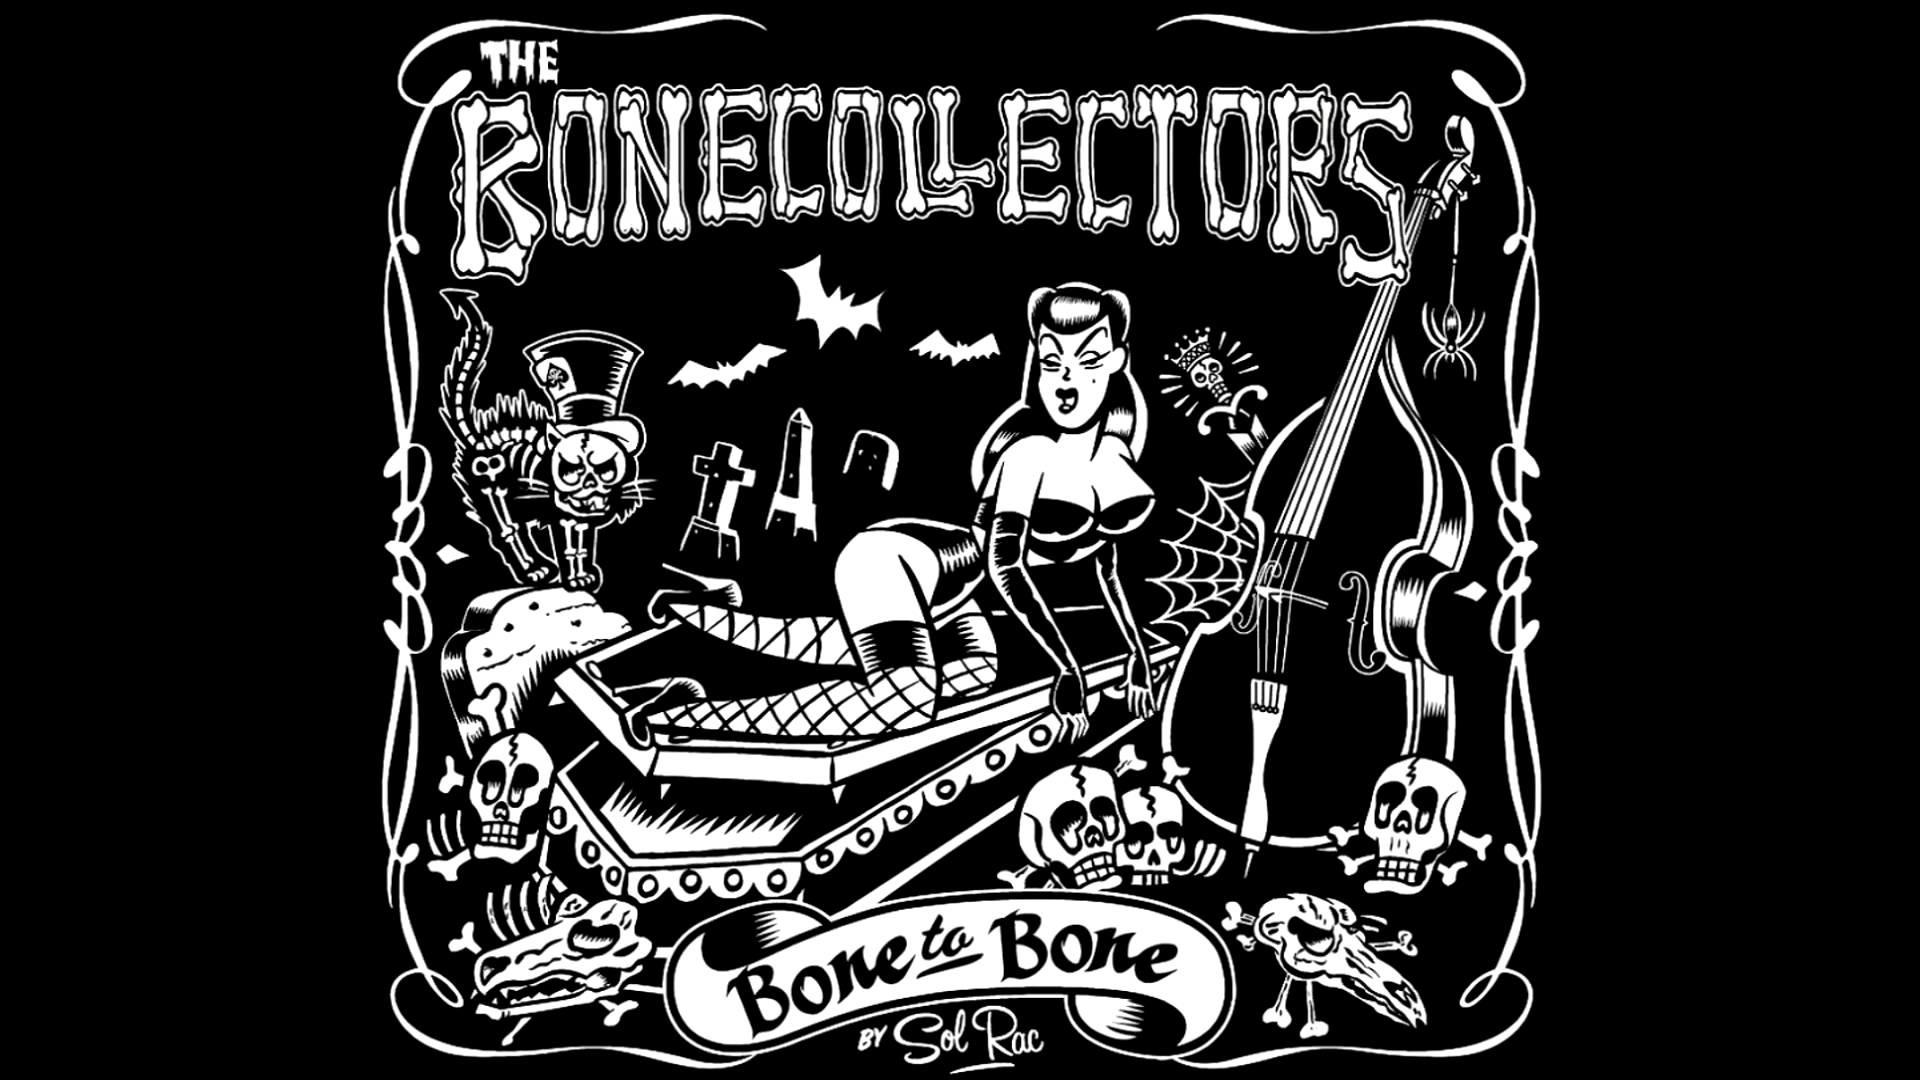 Res: 1920x1080, The BoneCollectors - Bela Lugosi's Dead (Bauhaus Rockabilly Cover)